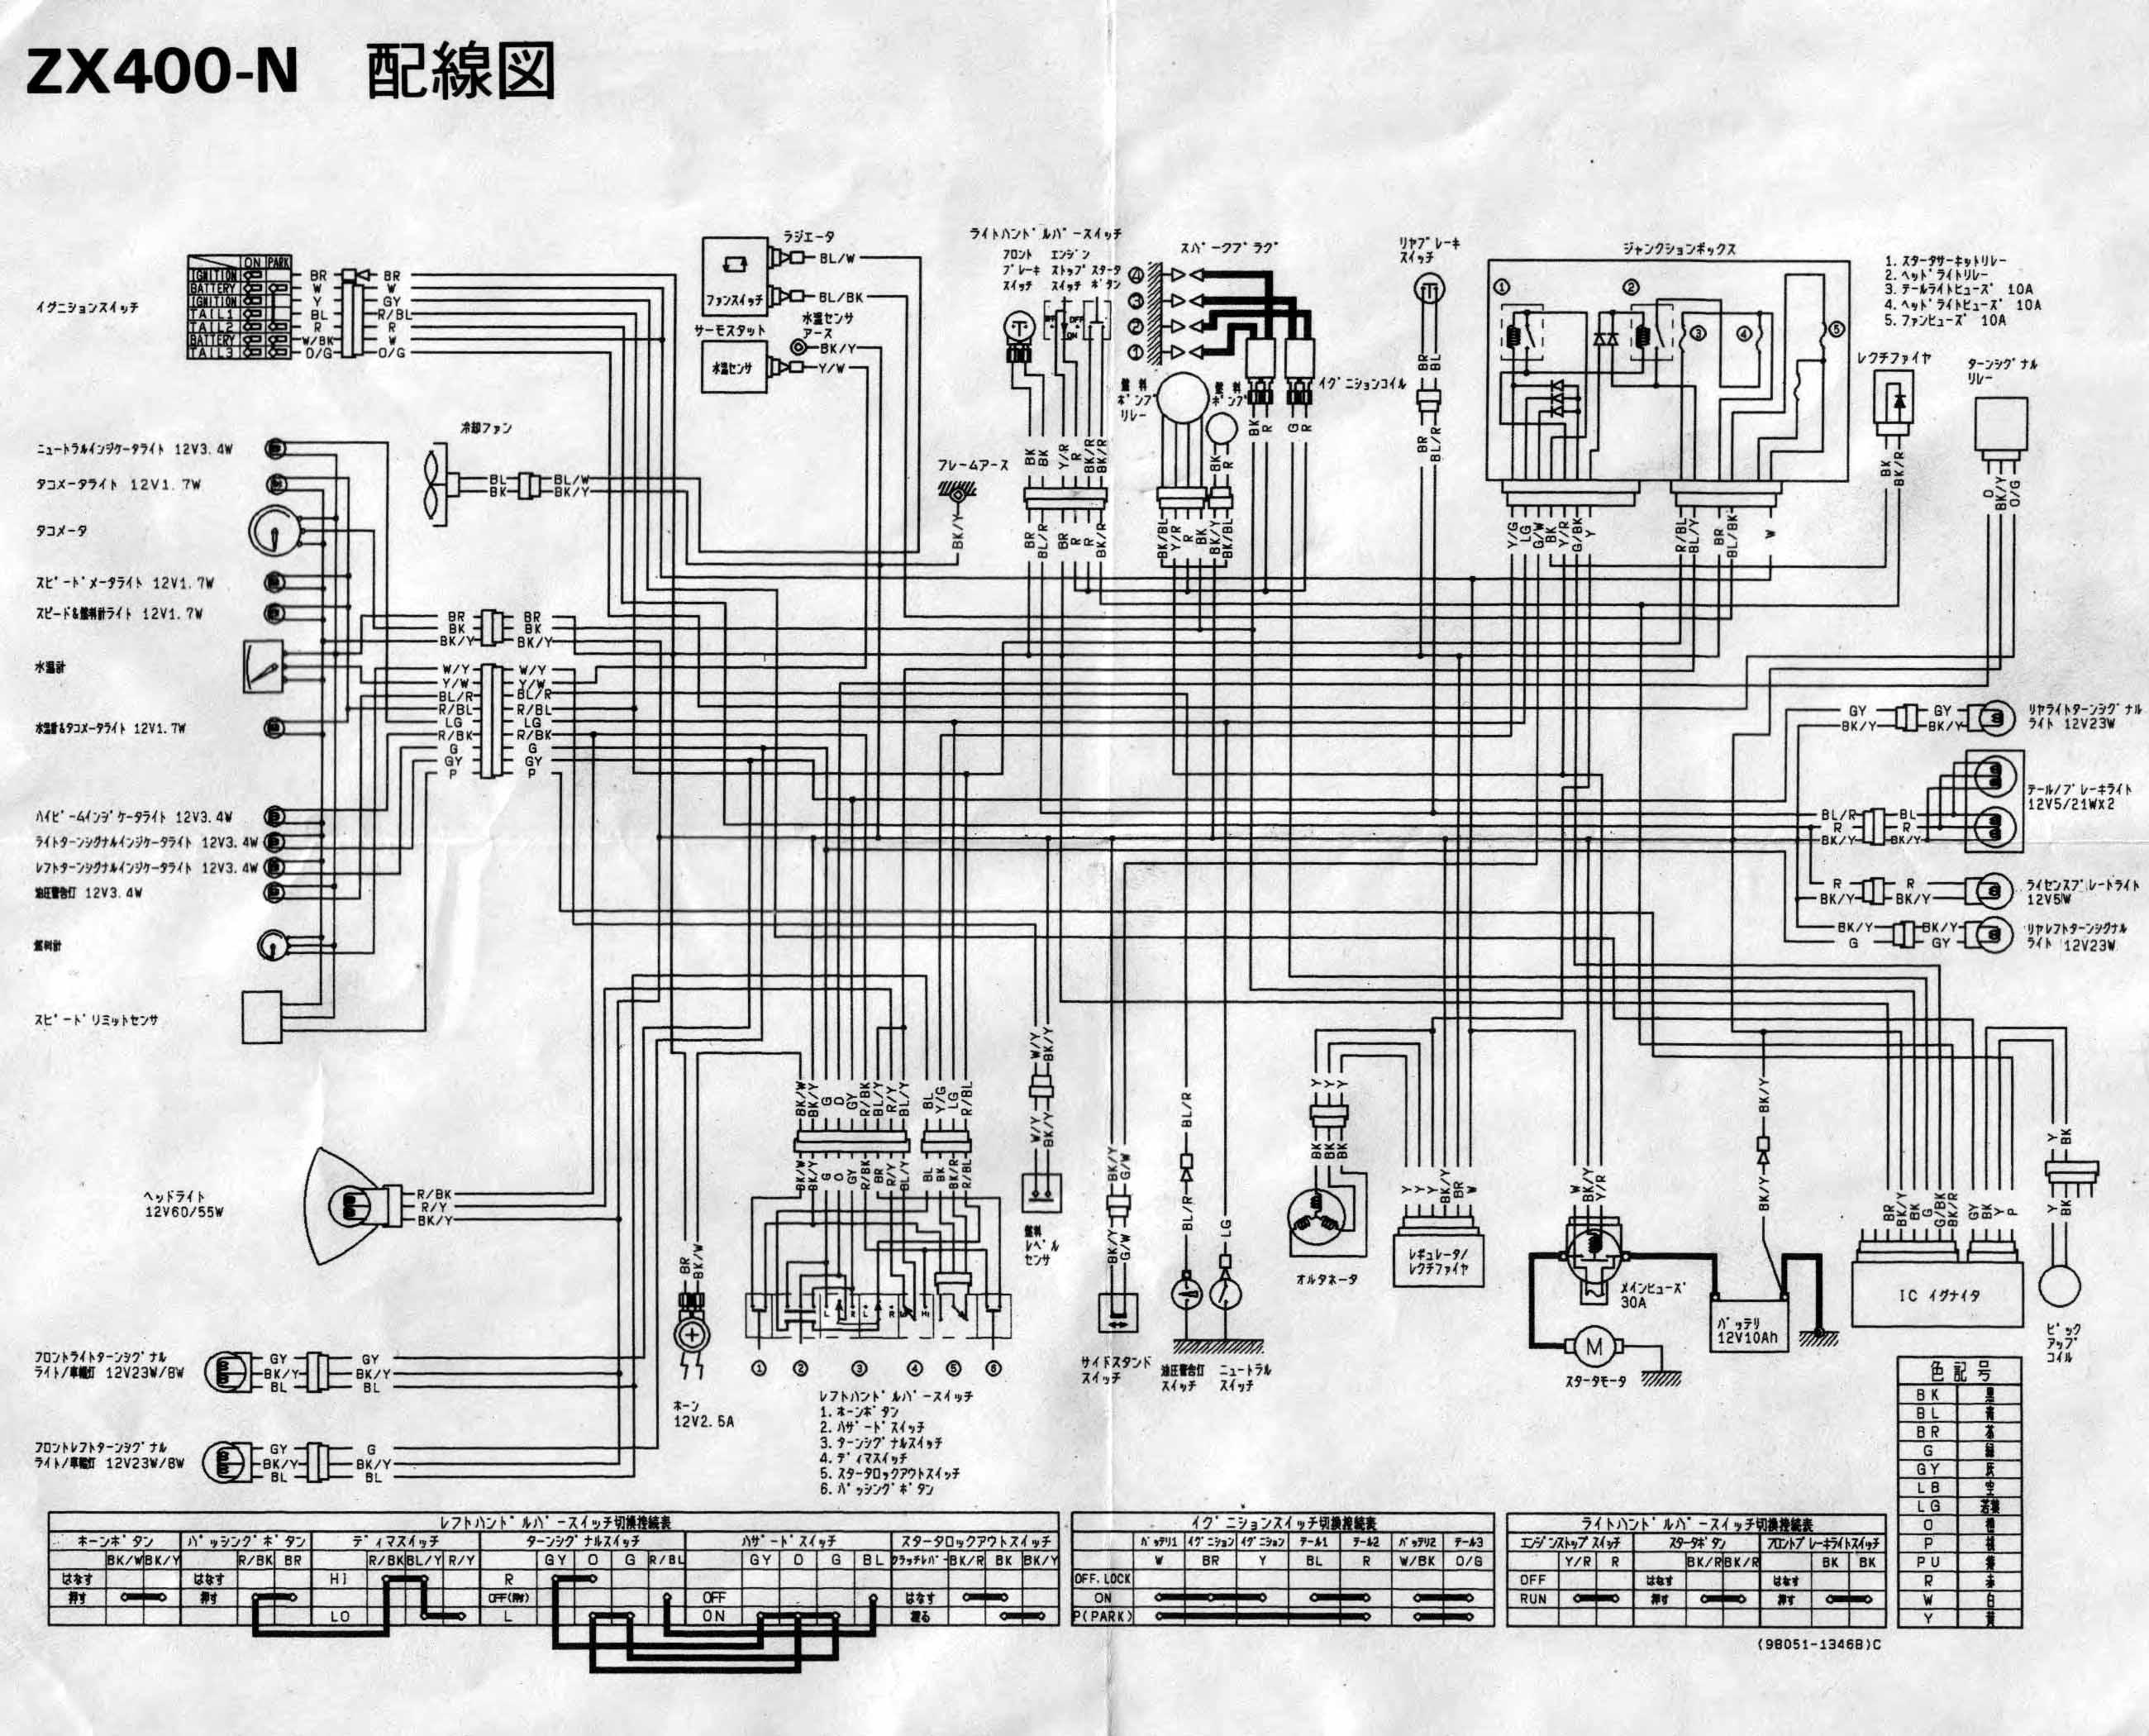 2013 Kymco Motorcycle Wiring Diagram Kawasaki Motorcycles Manual Pdf Wiring Diagram Amp Fault